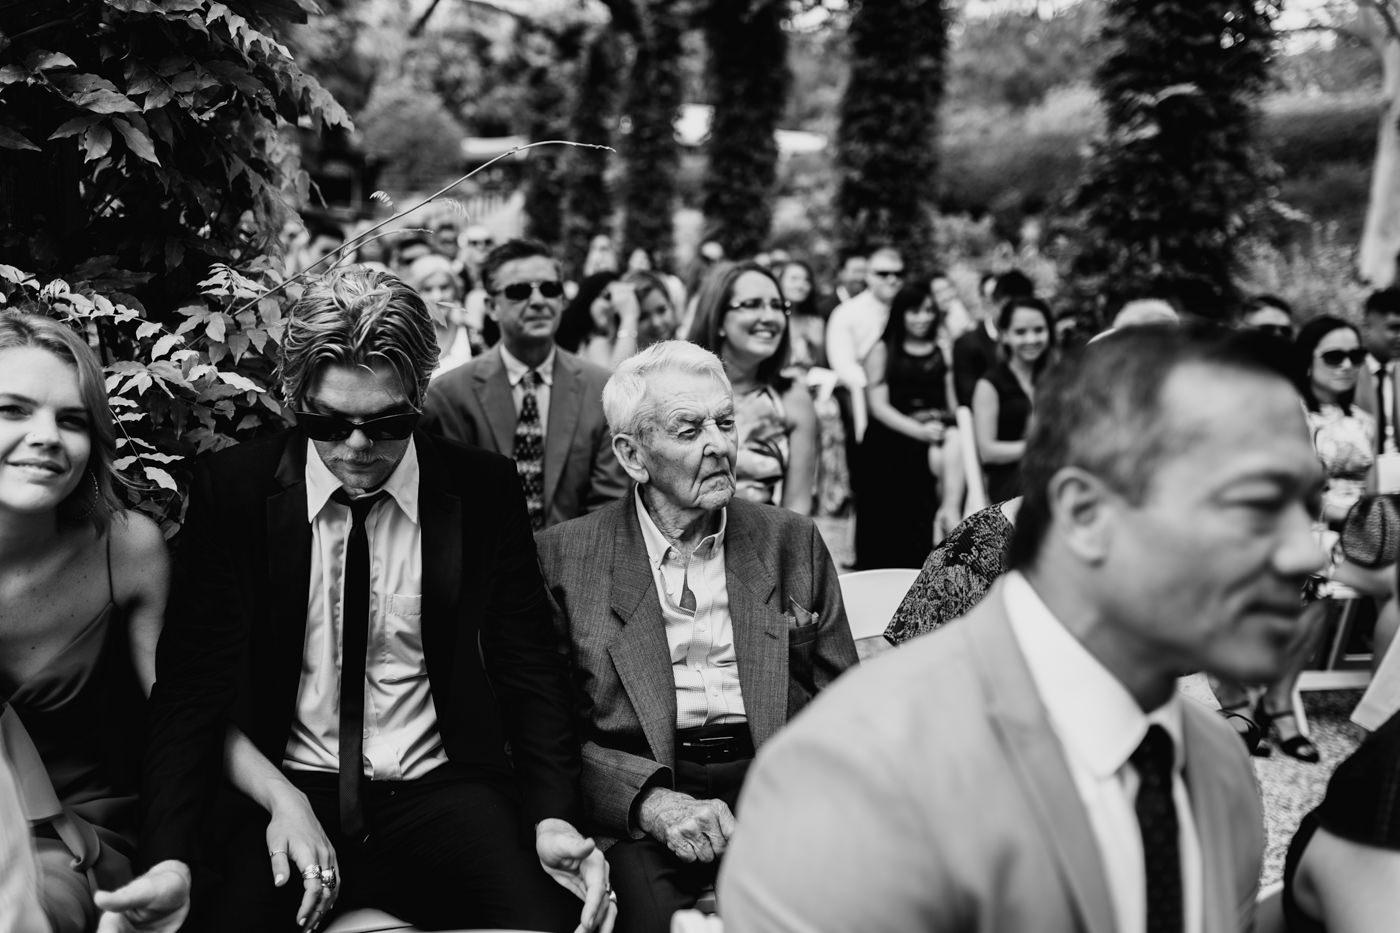 Nick & Vanezza - Fernbank Farm Wedding - Samantha Heather Photography-67.jpg